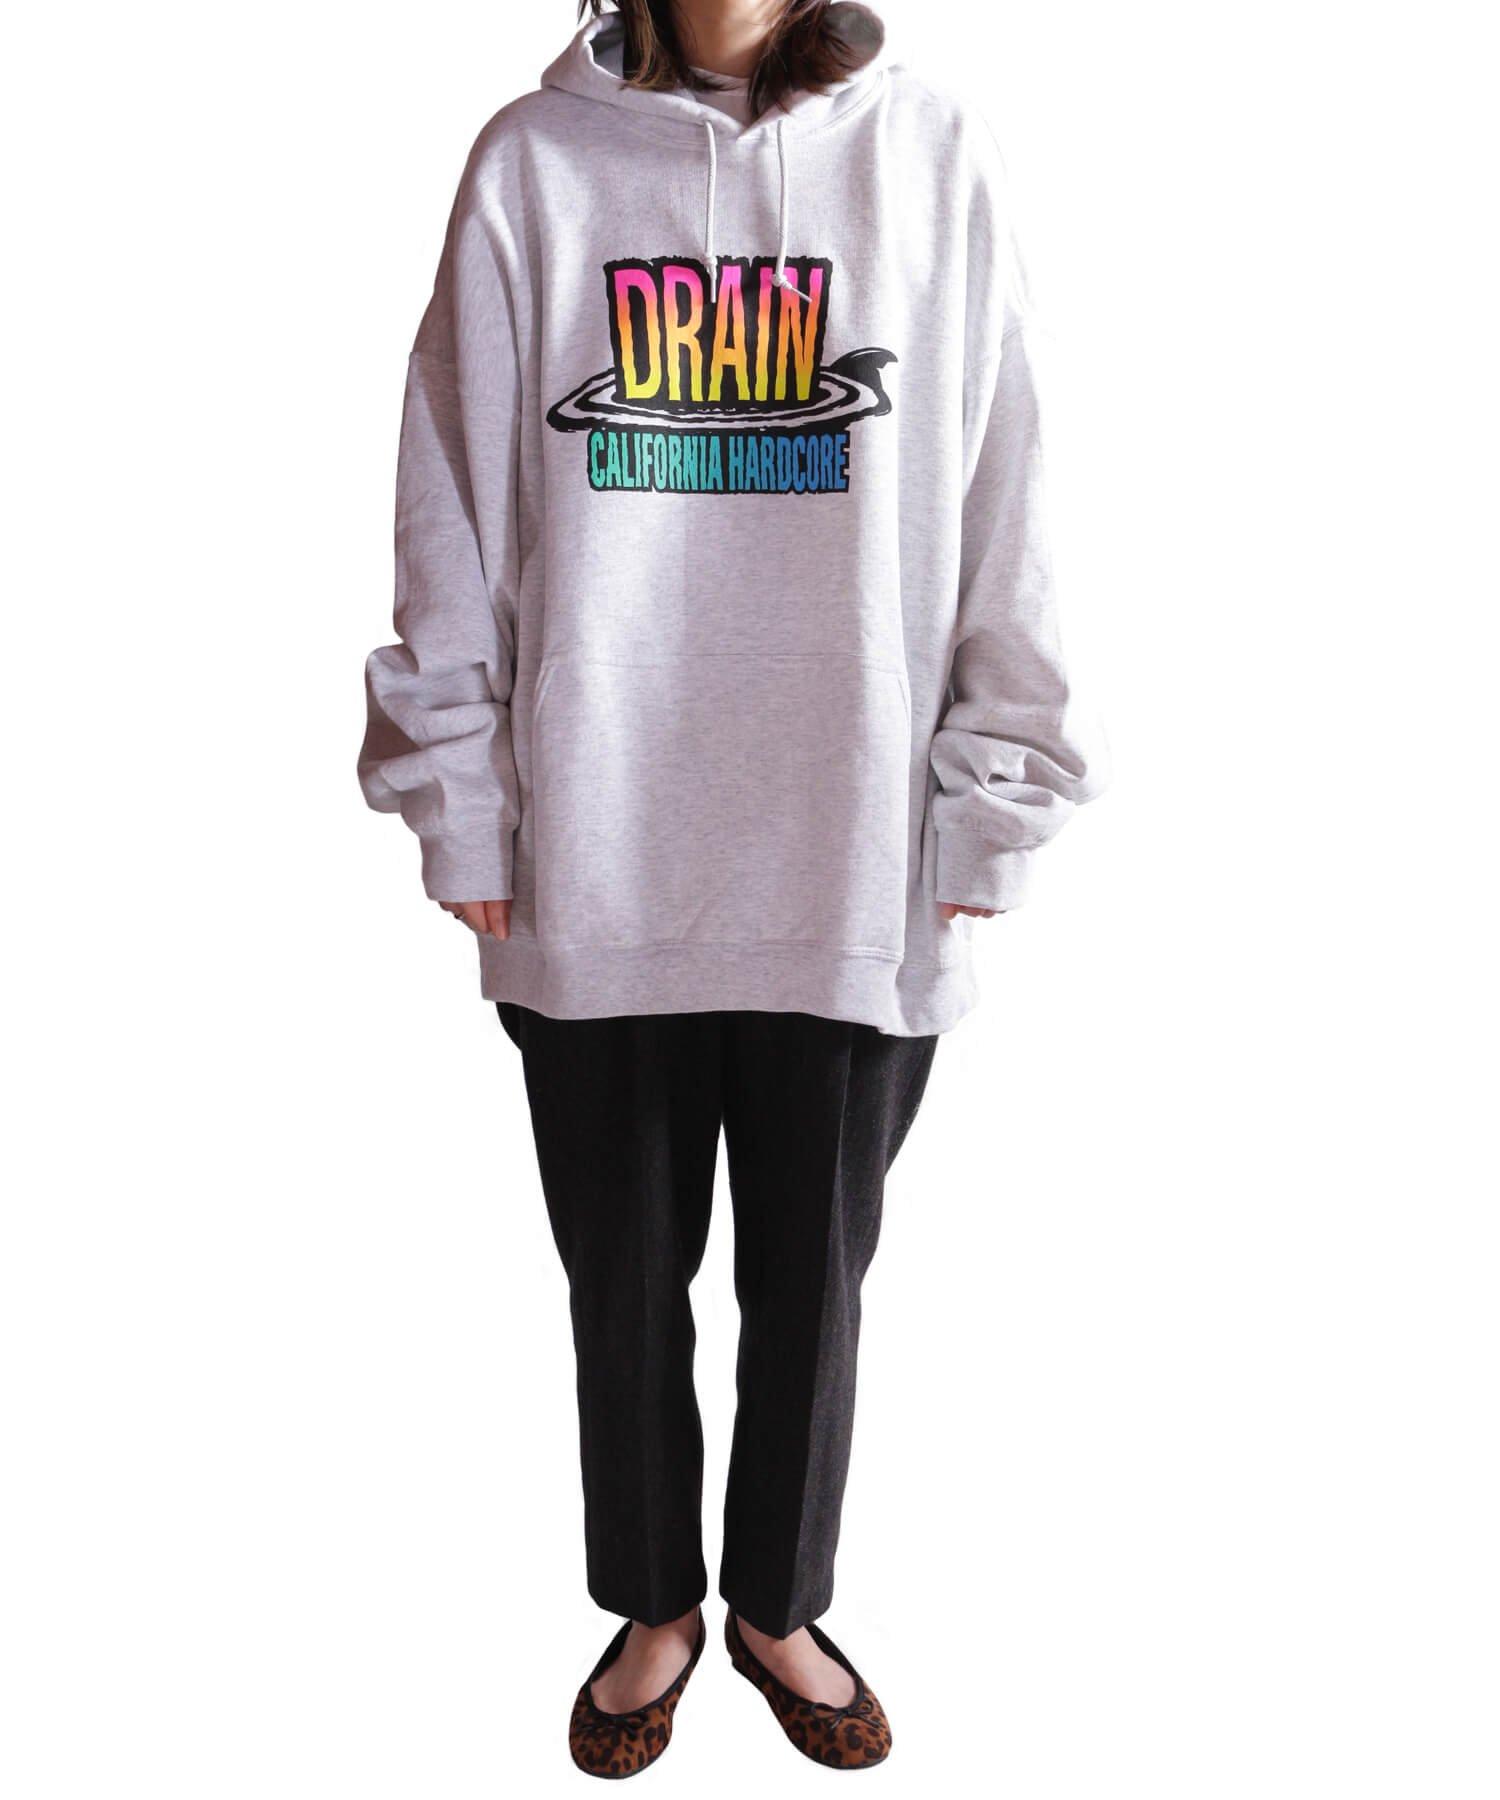 Official Artist Goods / バンドTなど  DRAIN / ドレイン:CALIFORNIA HARDCORE HOODED SWEATSHIRT (ASH GRAY) 商品画像18